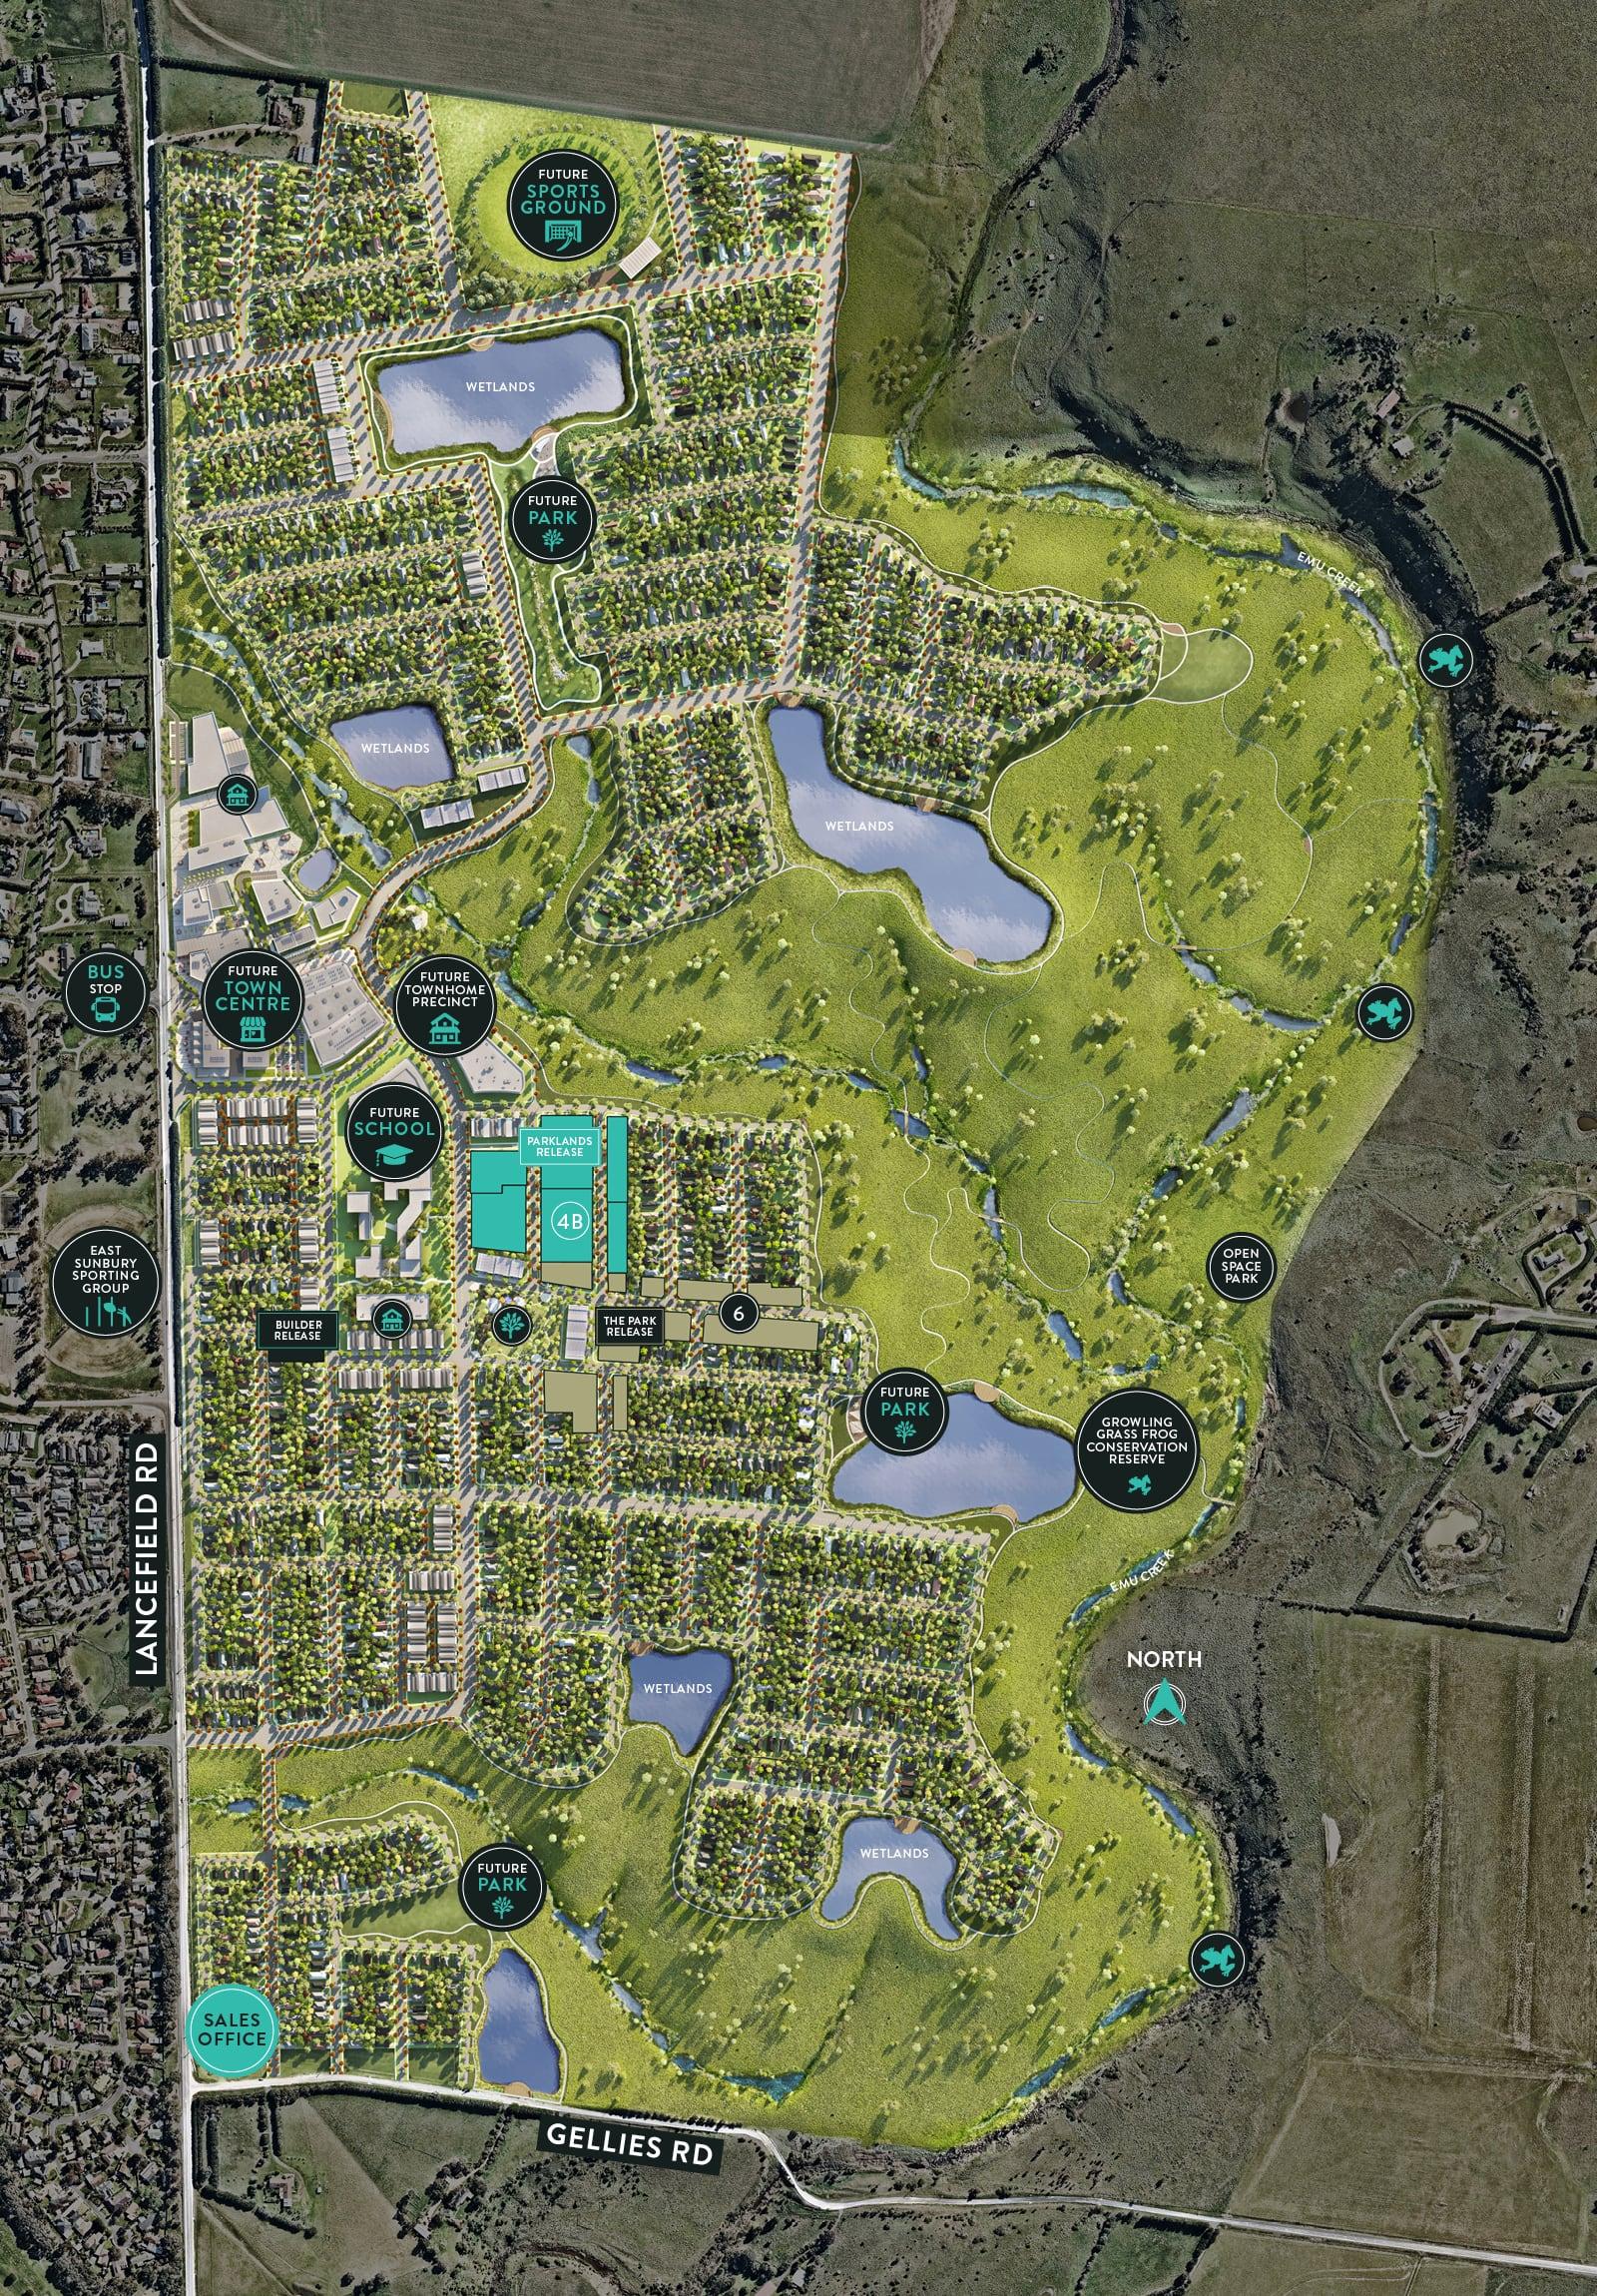 LRD23564 - KINGSFIELD - Masterplan Image